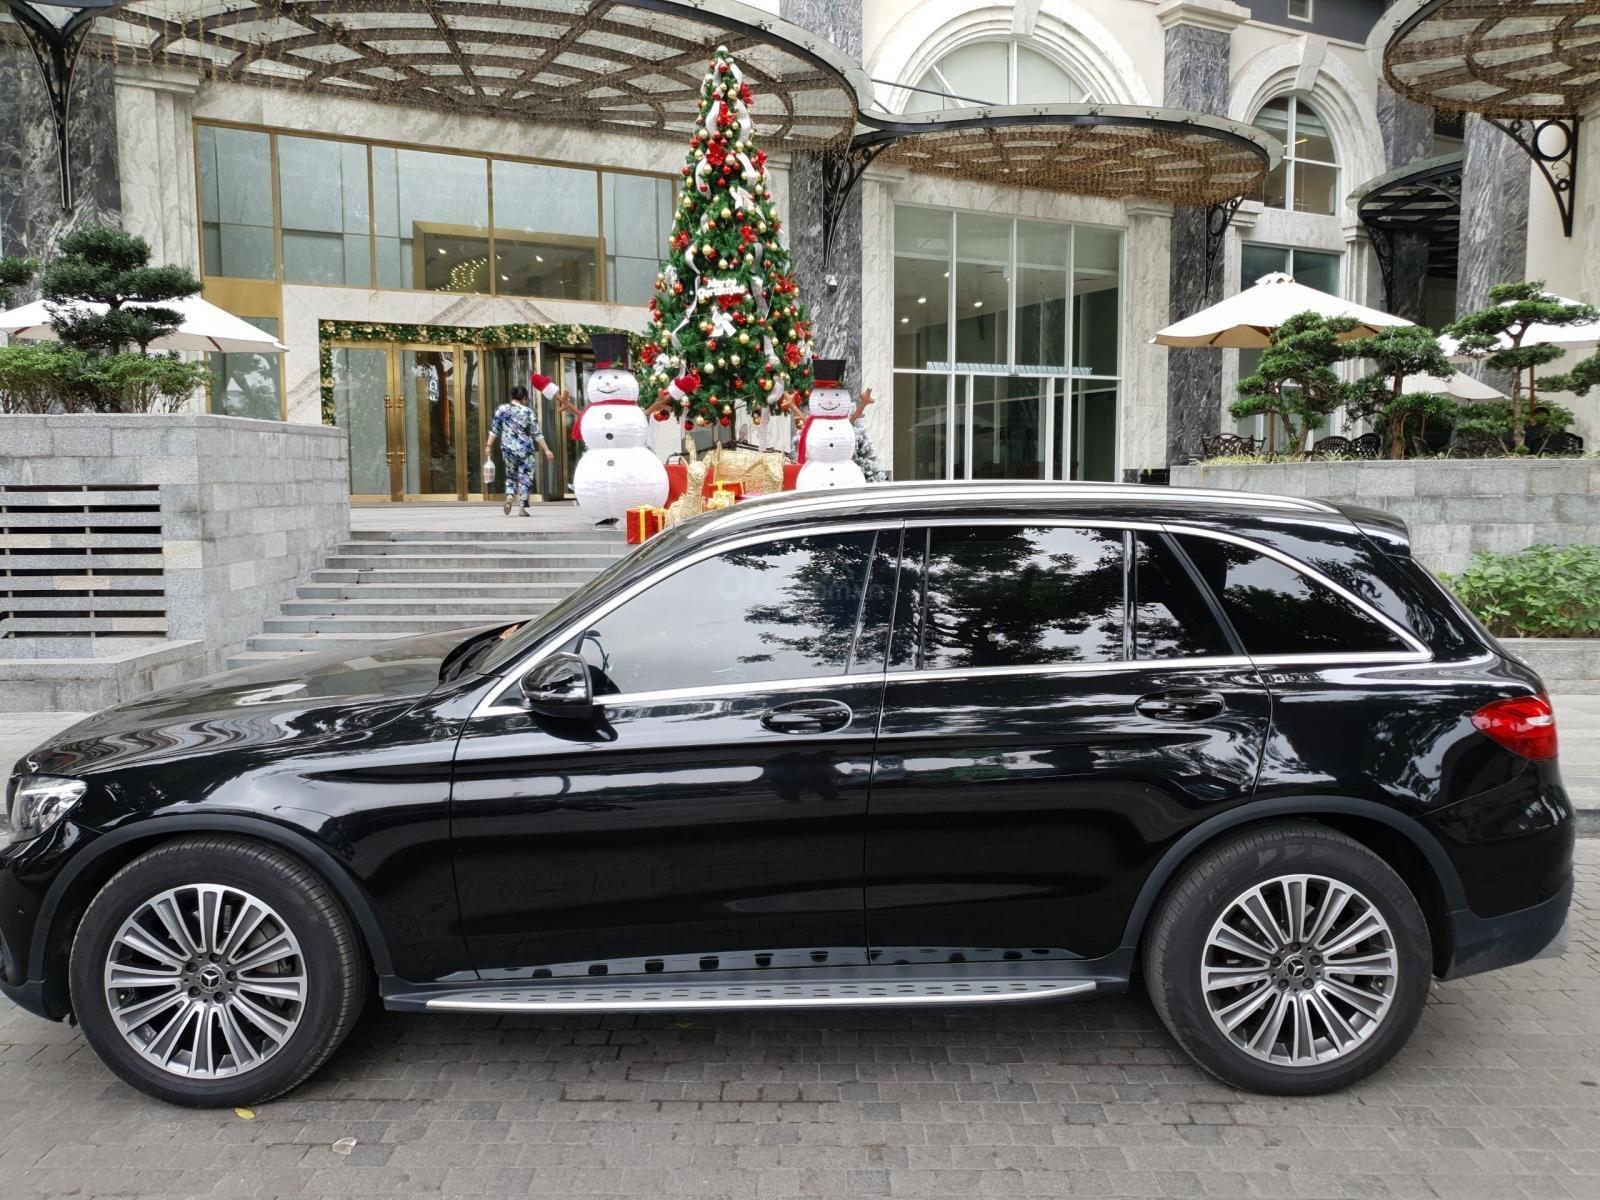 Bán Mercedes Benz GLC 250 đen nâu 2018 (2)